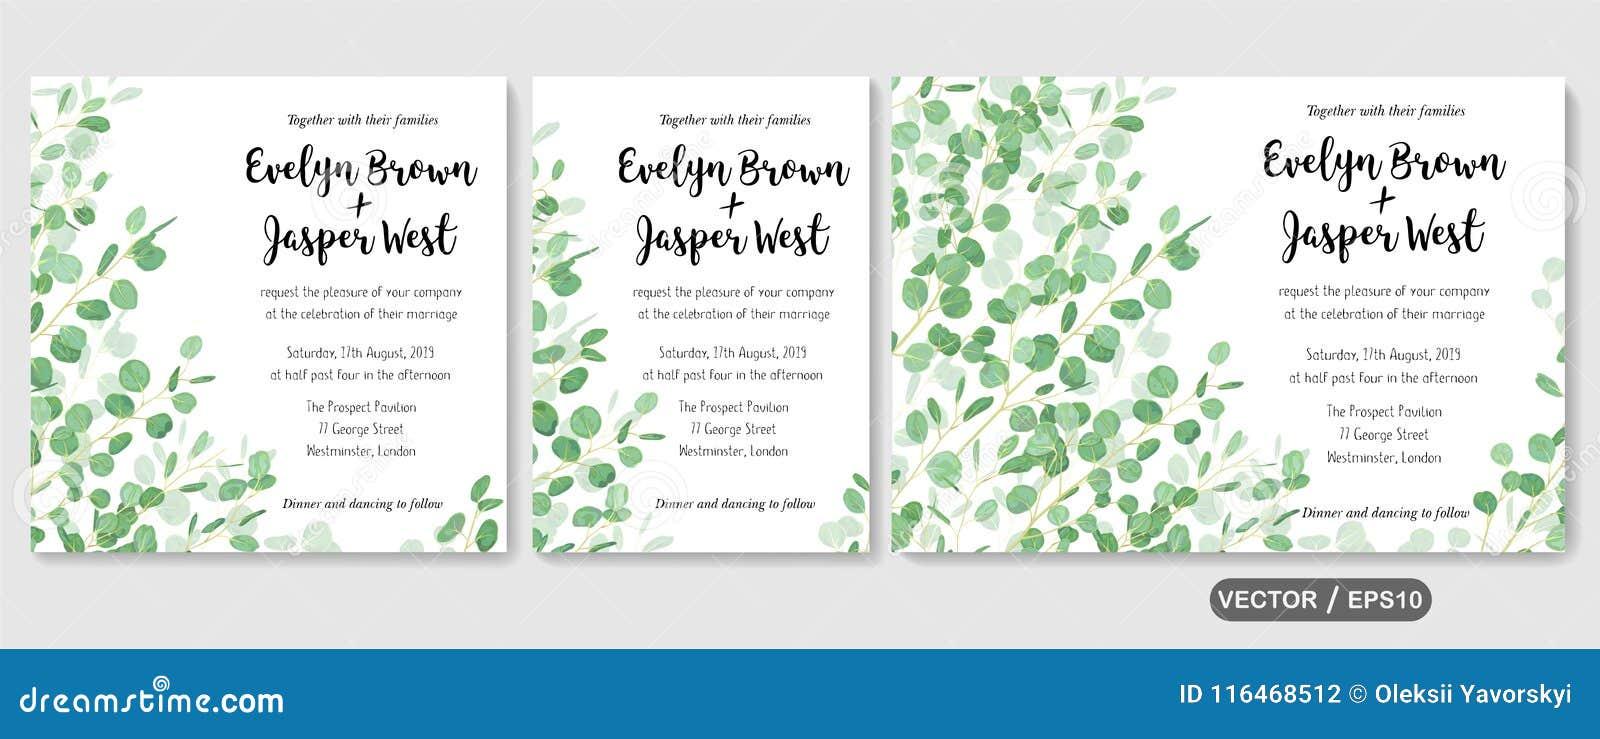 Wedding invite, invitation rsvp thank you card vector floral greenery design: evergreen leaf Eucalyptus branch, foliage herbs